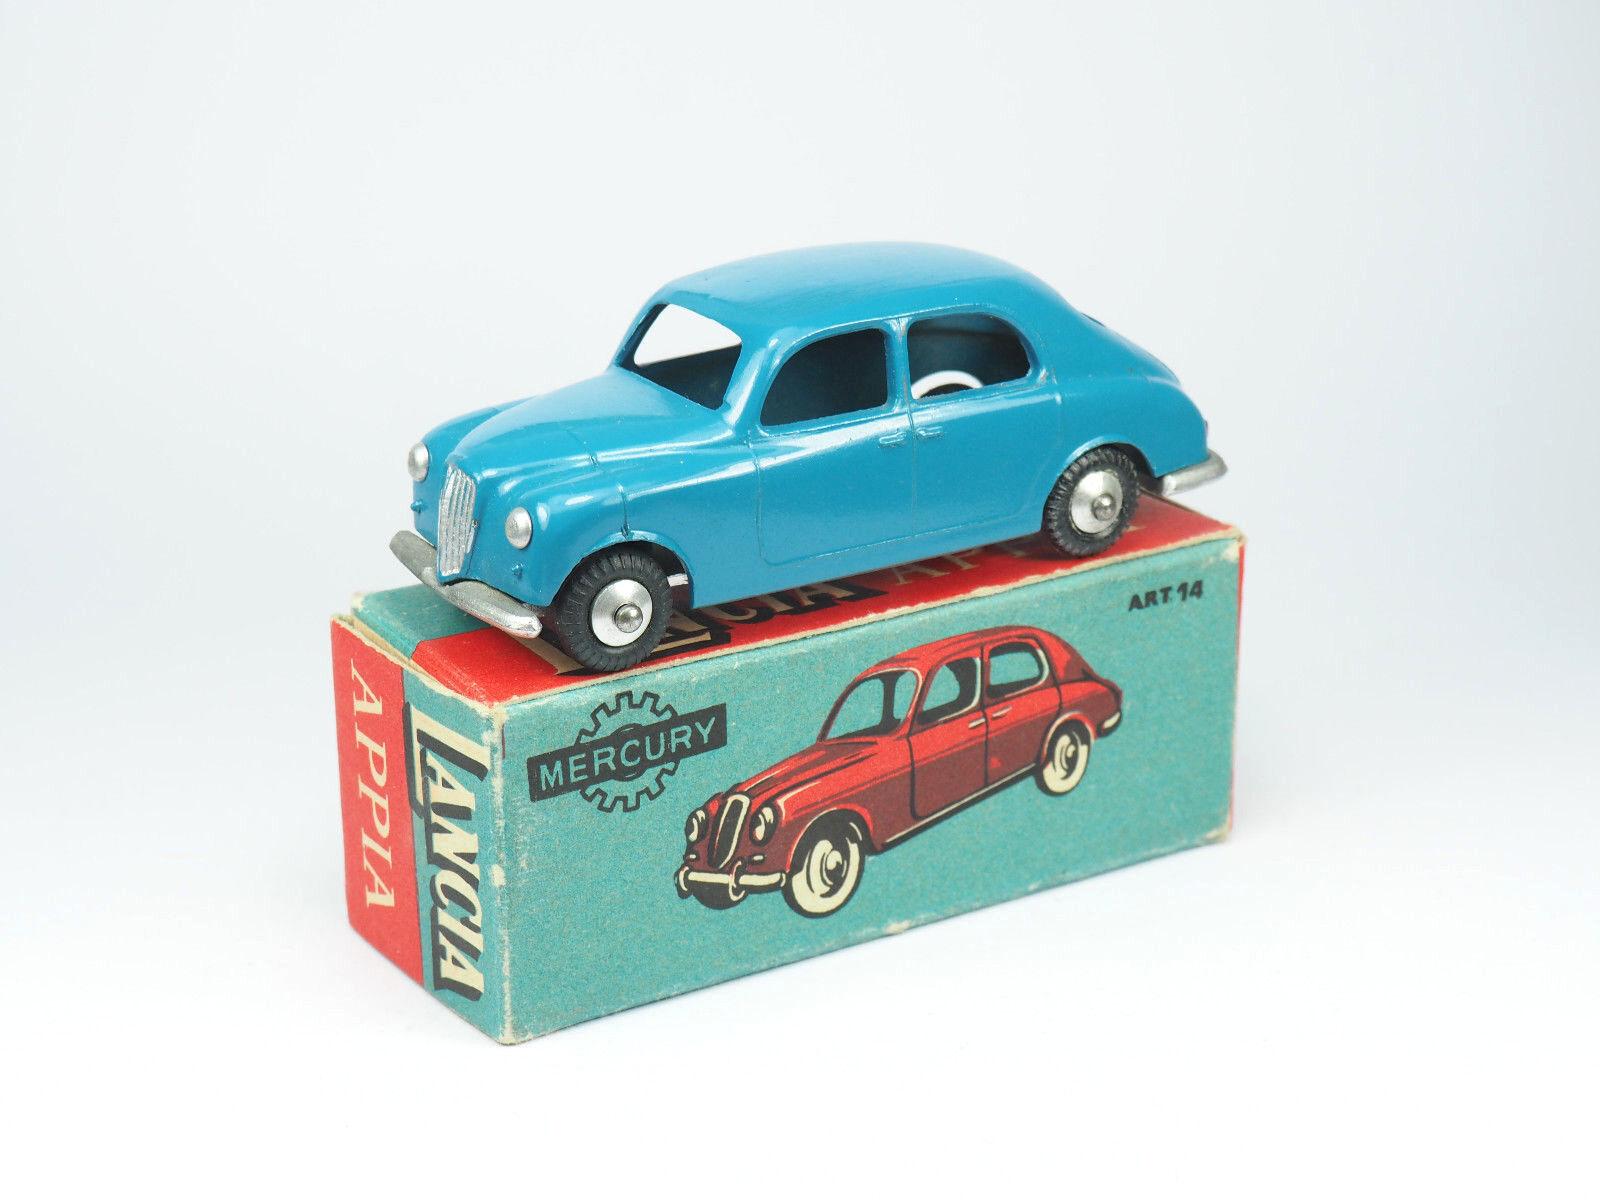 MERCURY - Art 14 - Lancia Appia Bleu - - - 1/48e - Italy - Boite d'origine 44b7aa